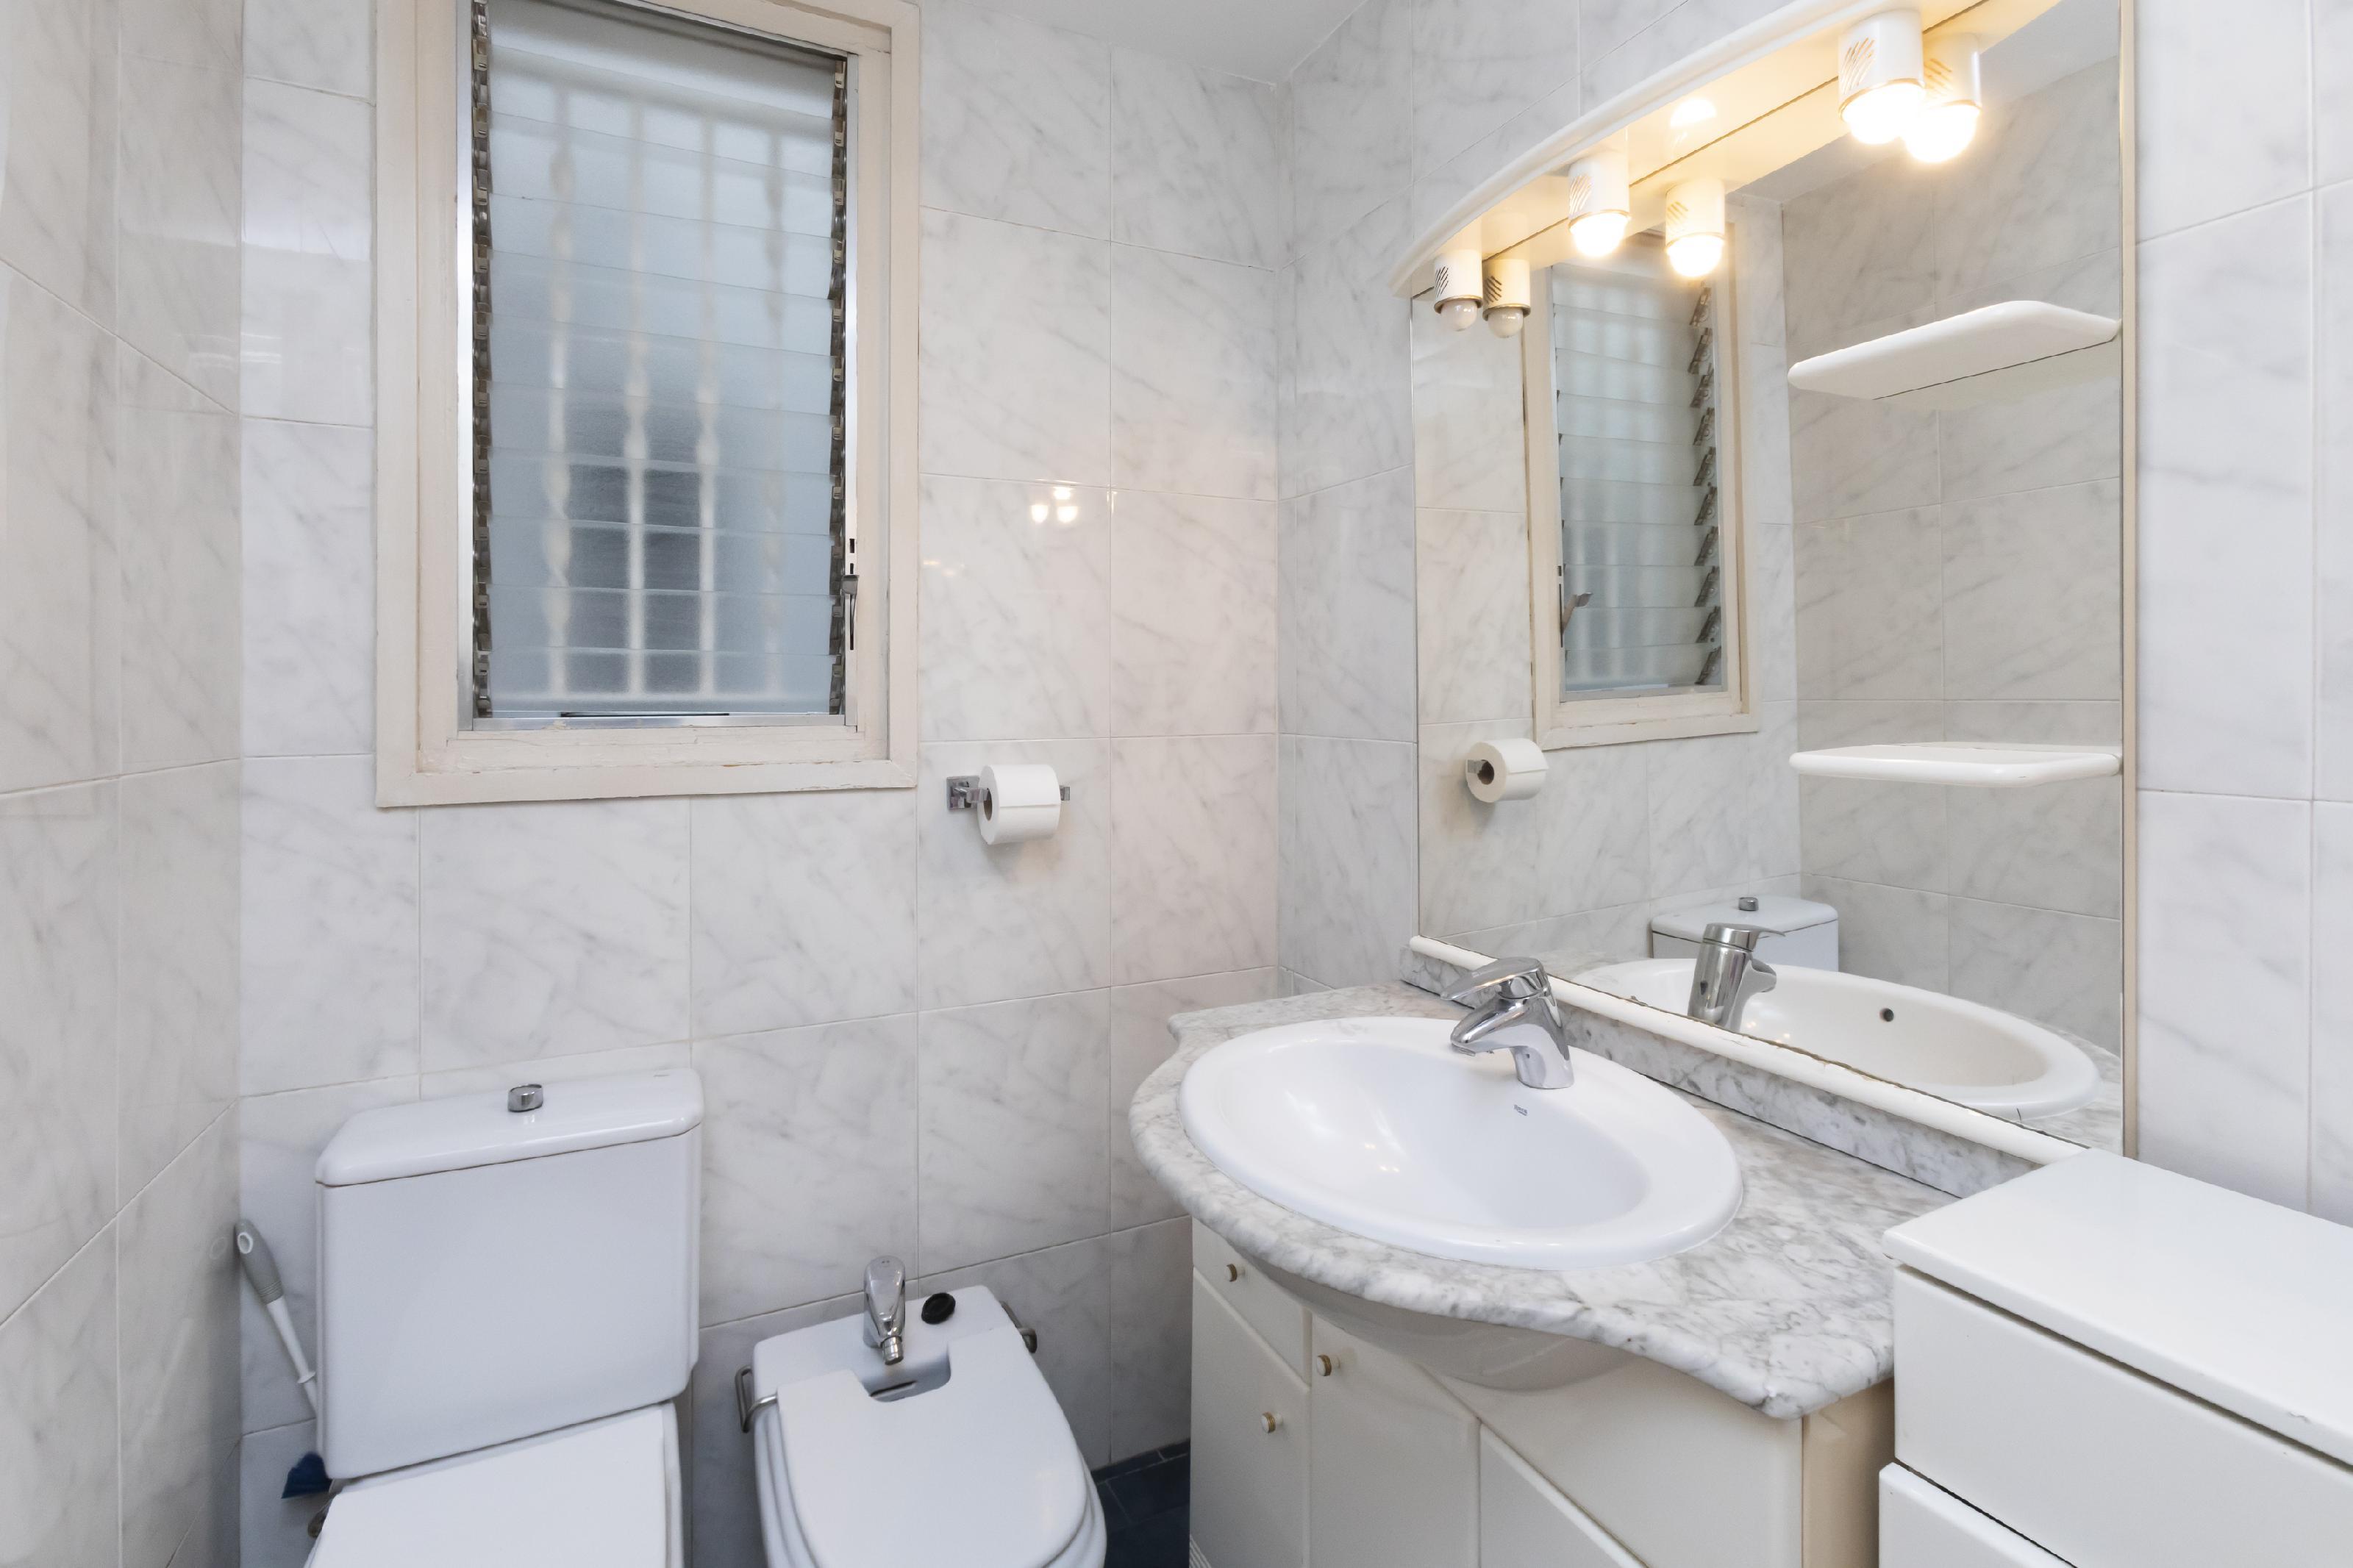 247097 Flat for sale in Sarrià-Sant Gervasi, Sant Gervasi-Galvany 24